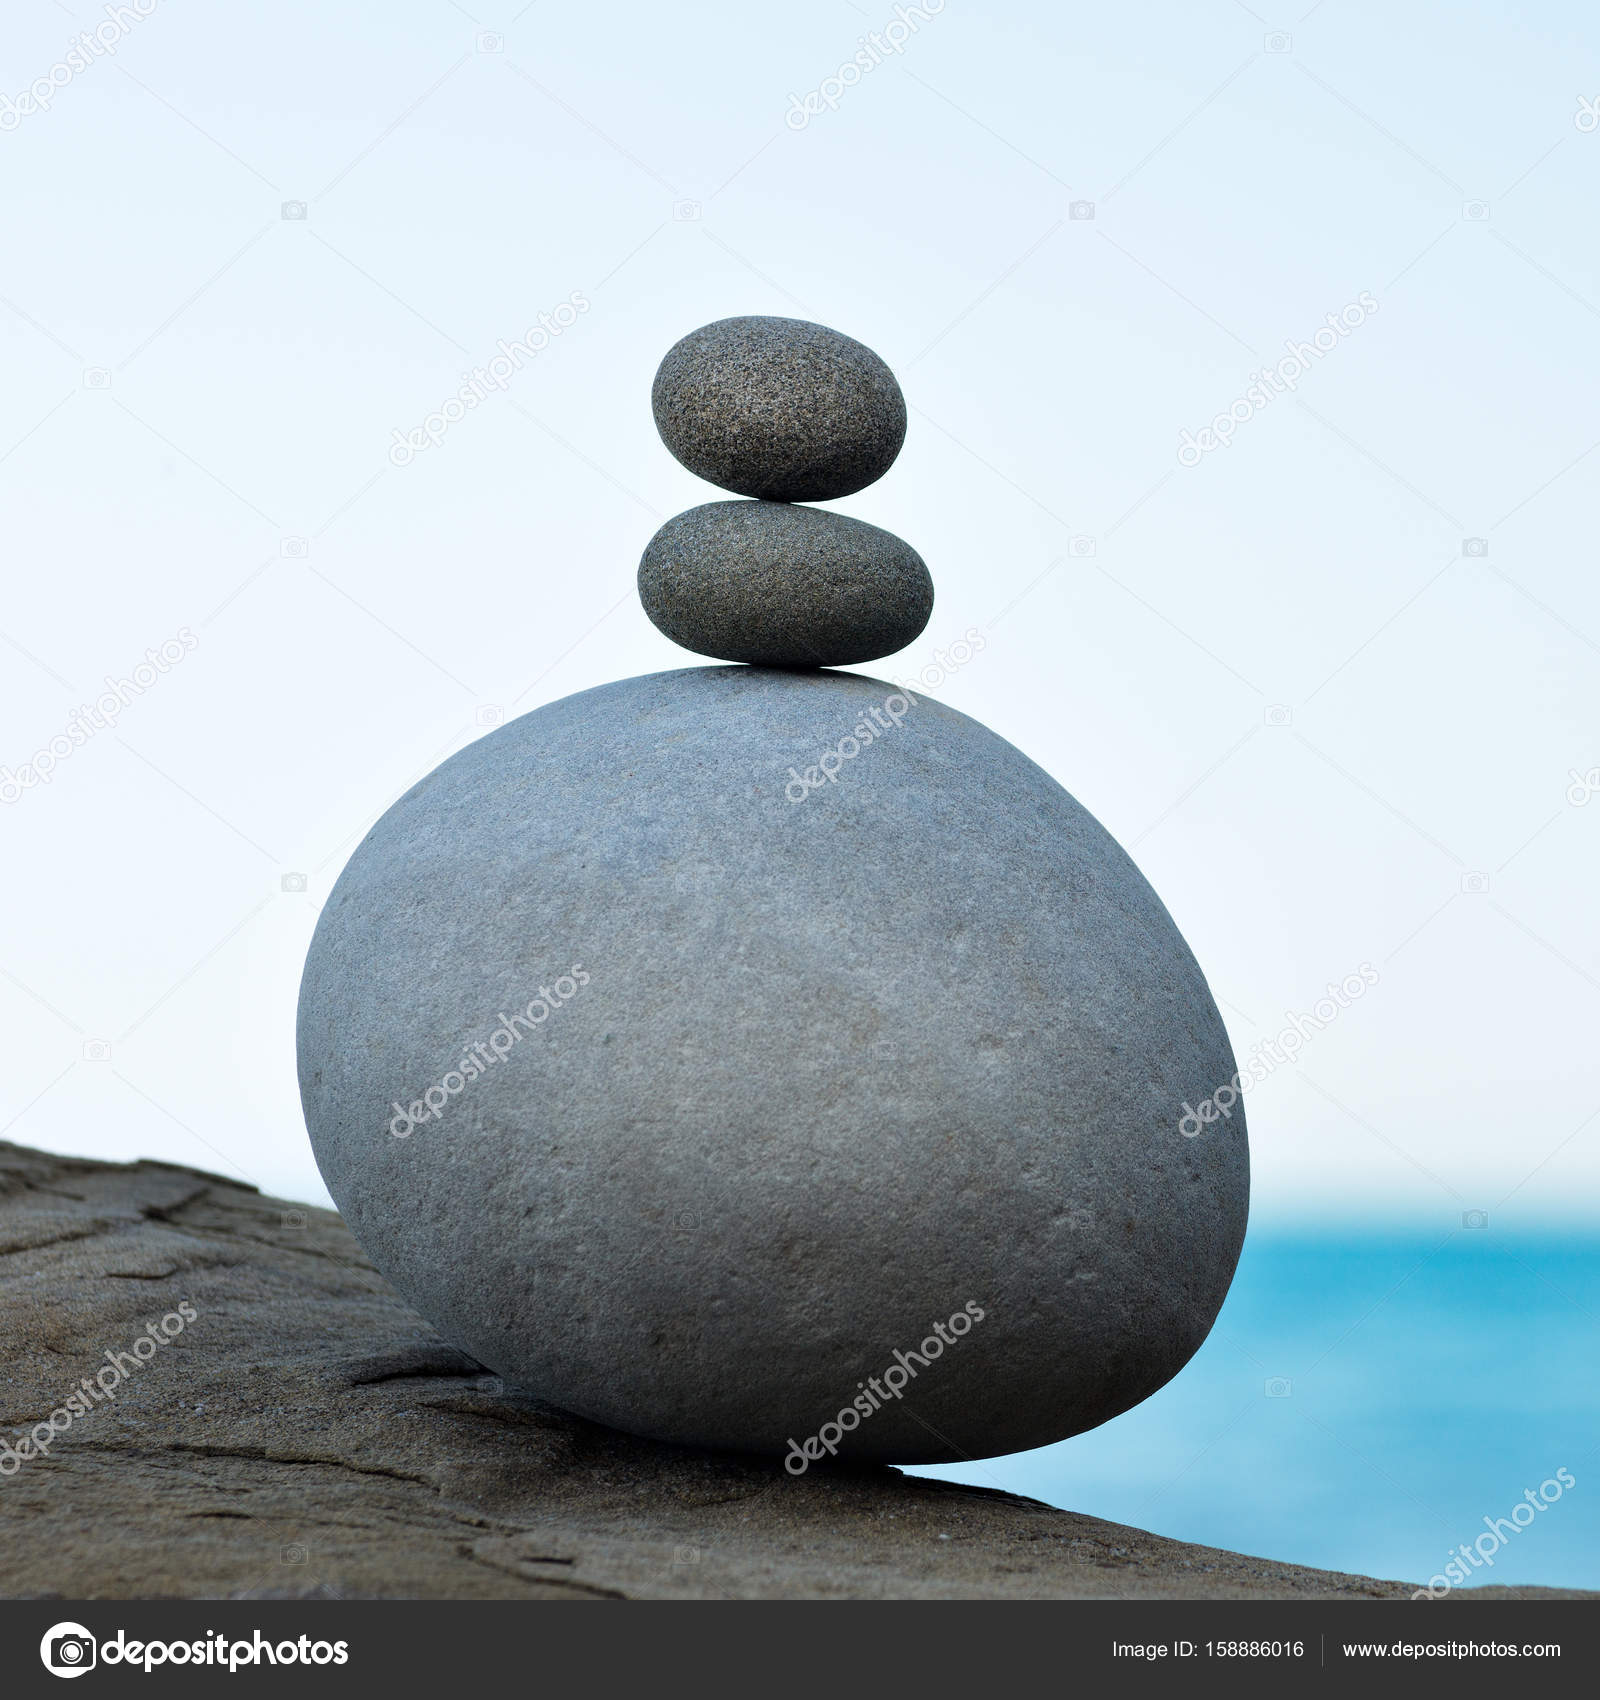 Pebble balance photo